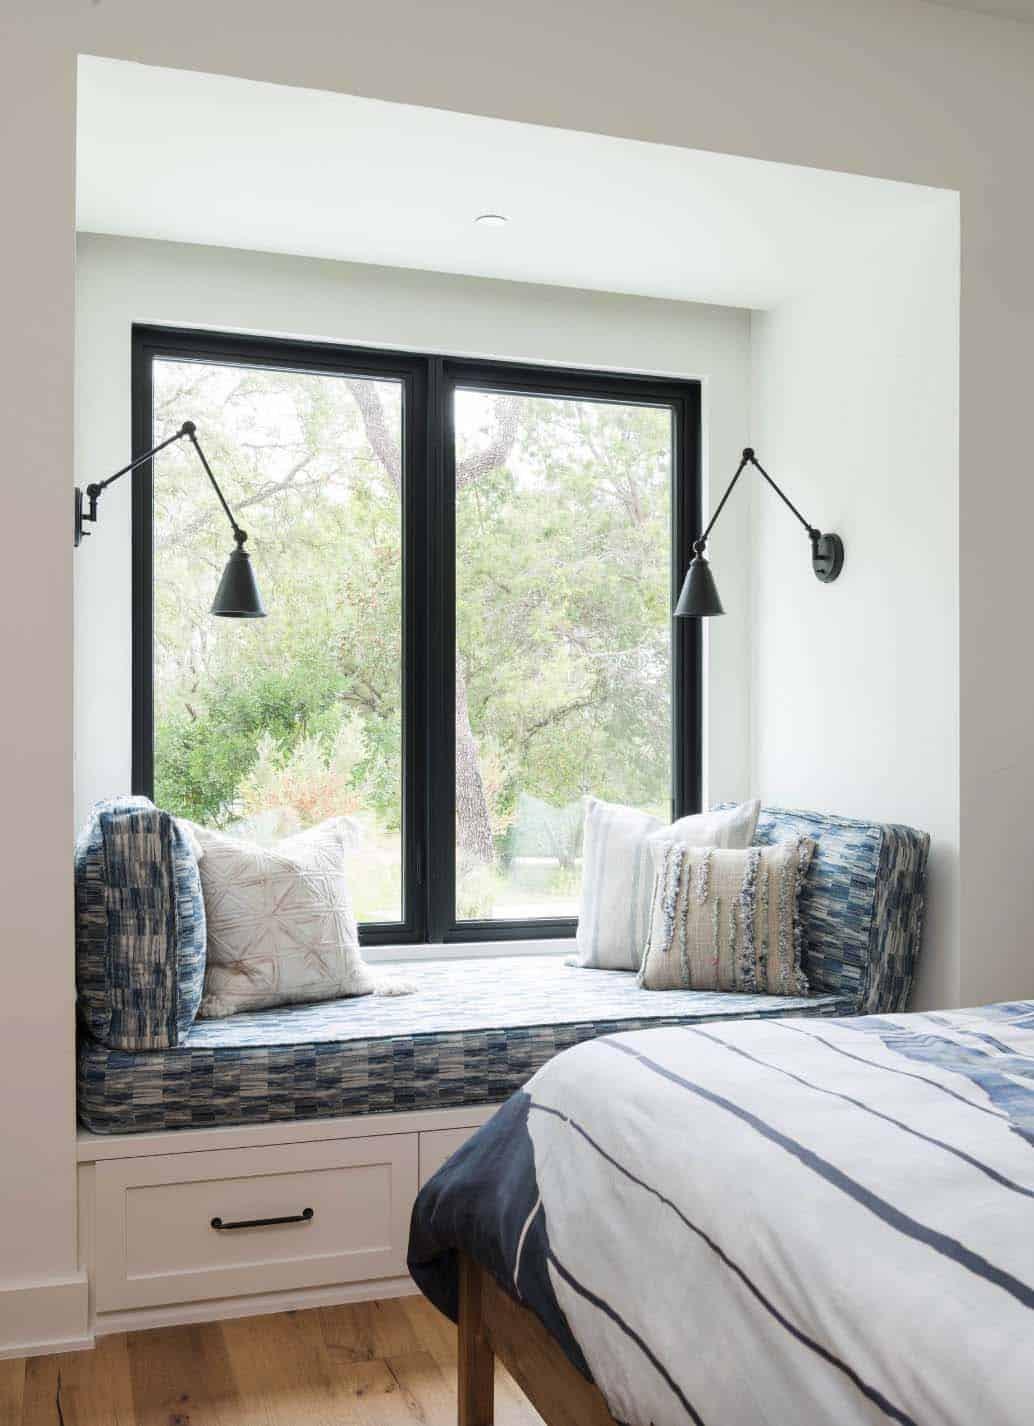 Modern farmhouse style in Texas showcases fantastic design